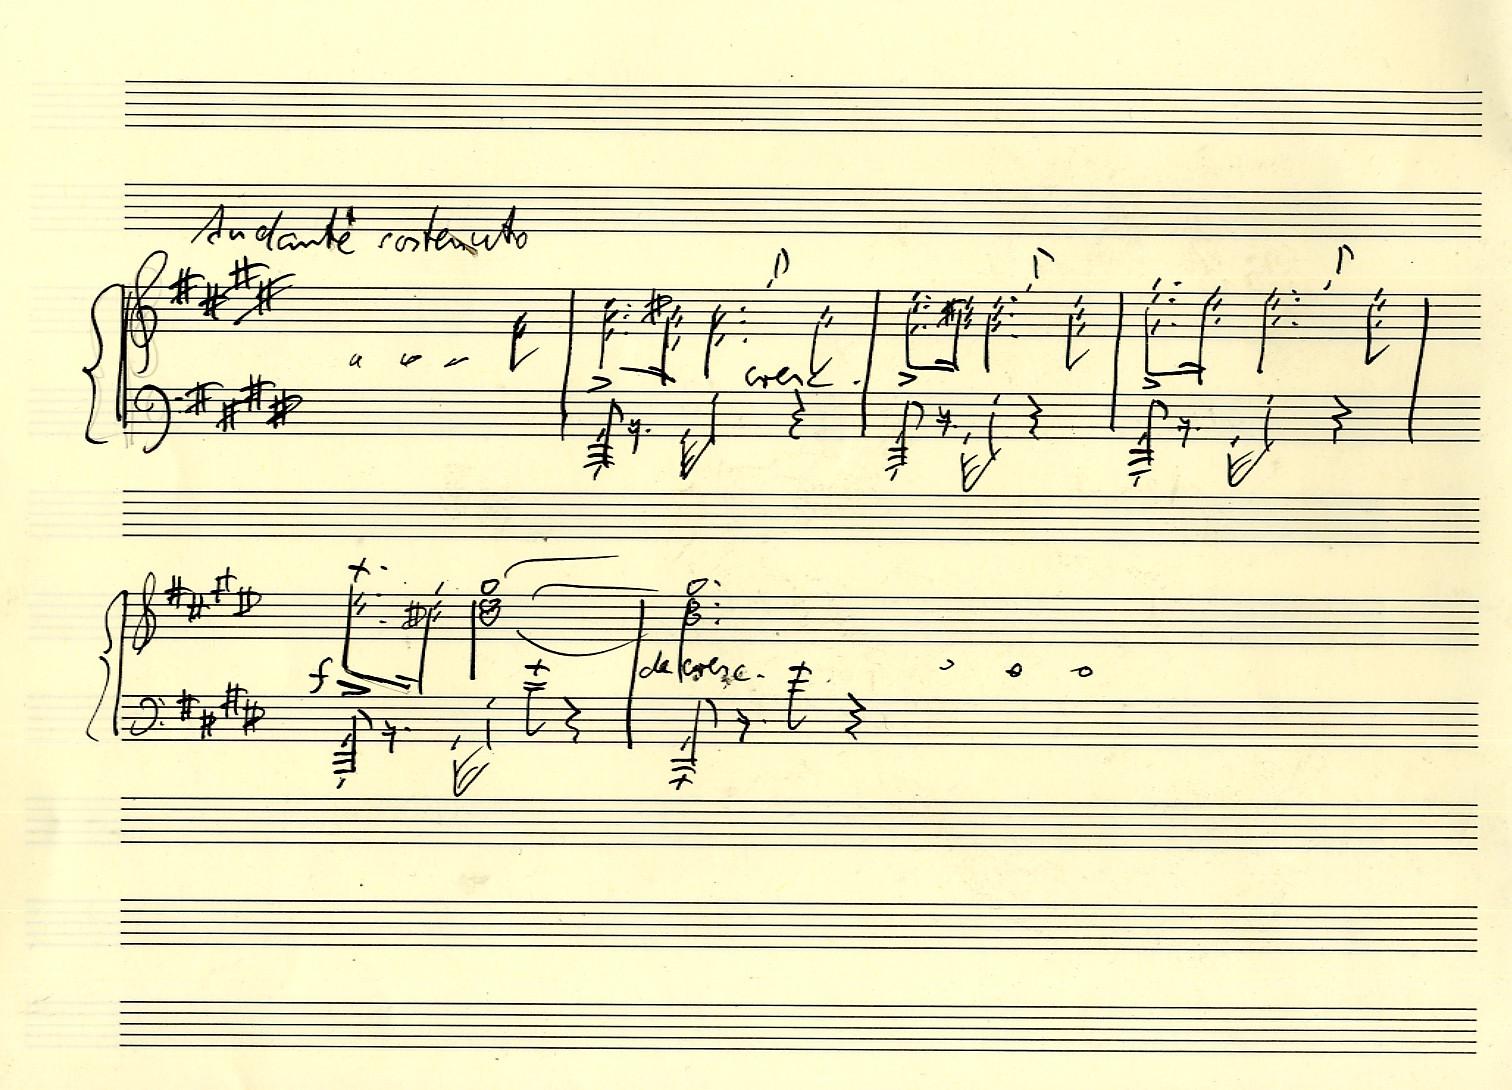 Schubert Sonate B-Dur D 960 II Takte 8-13